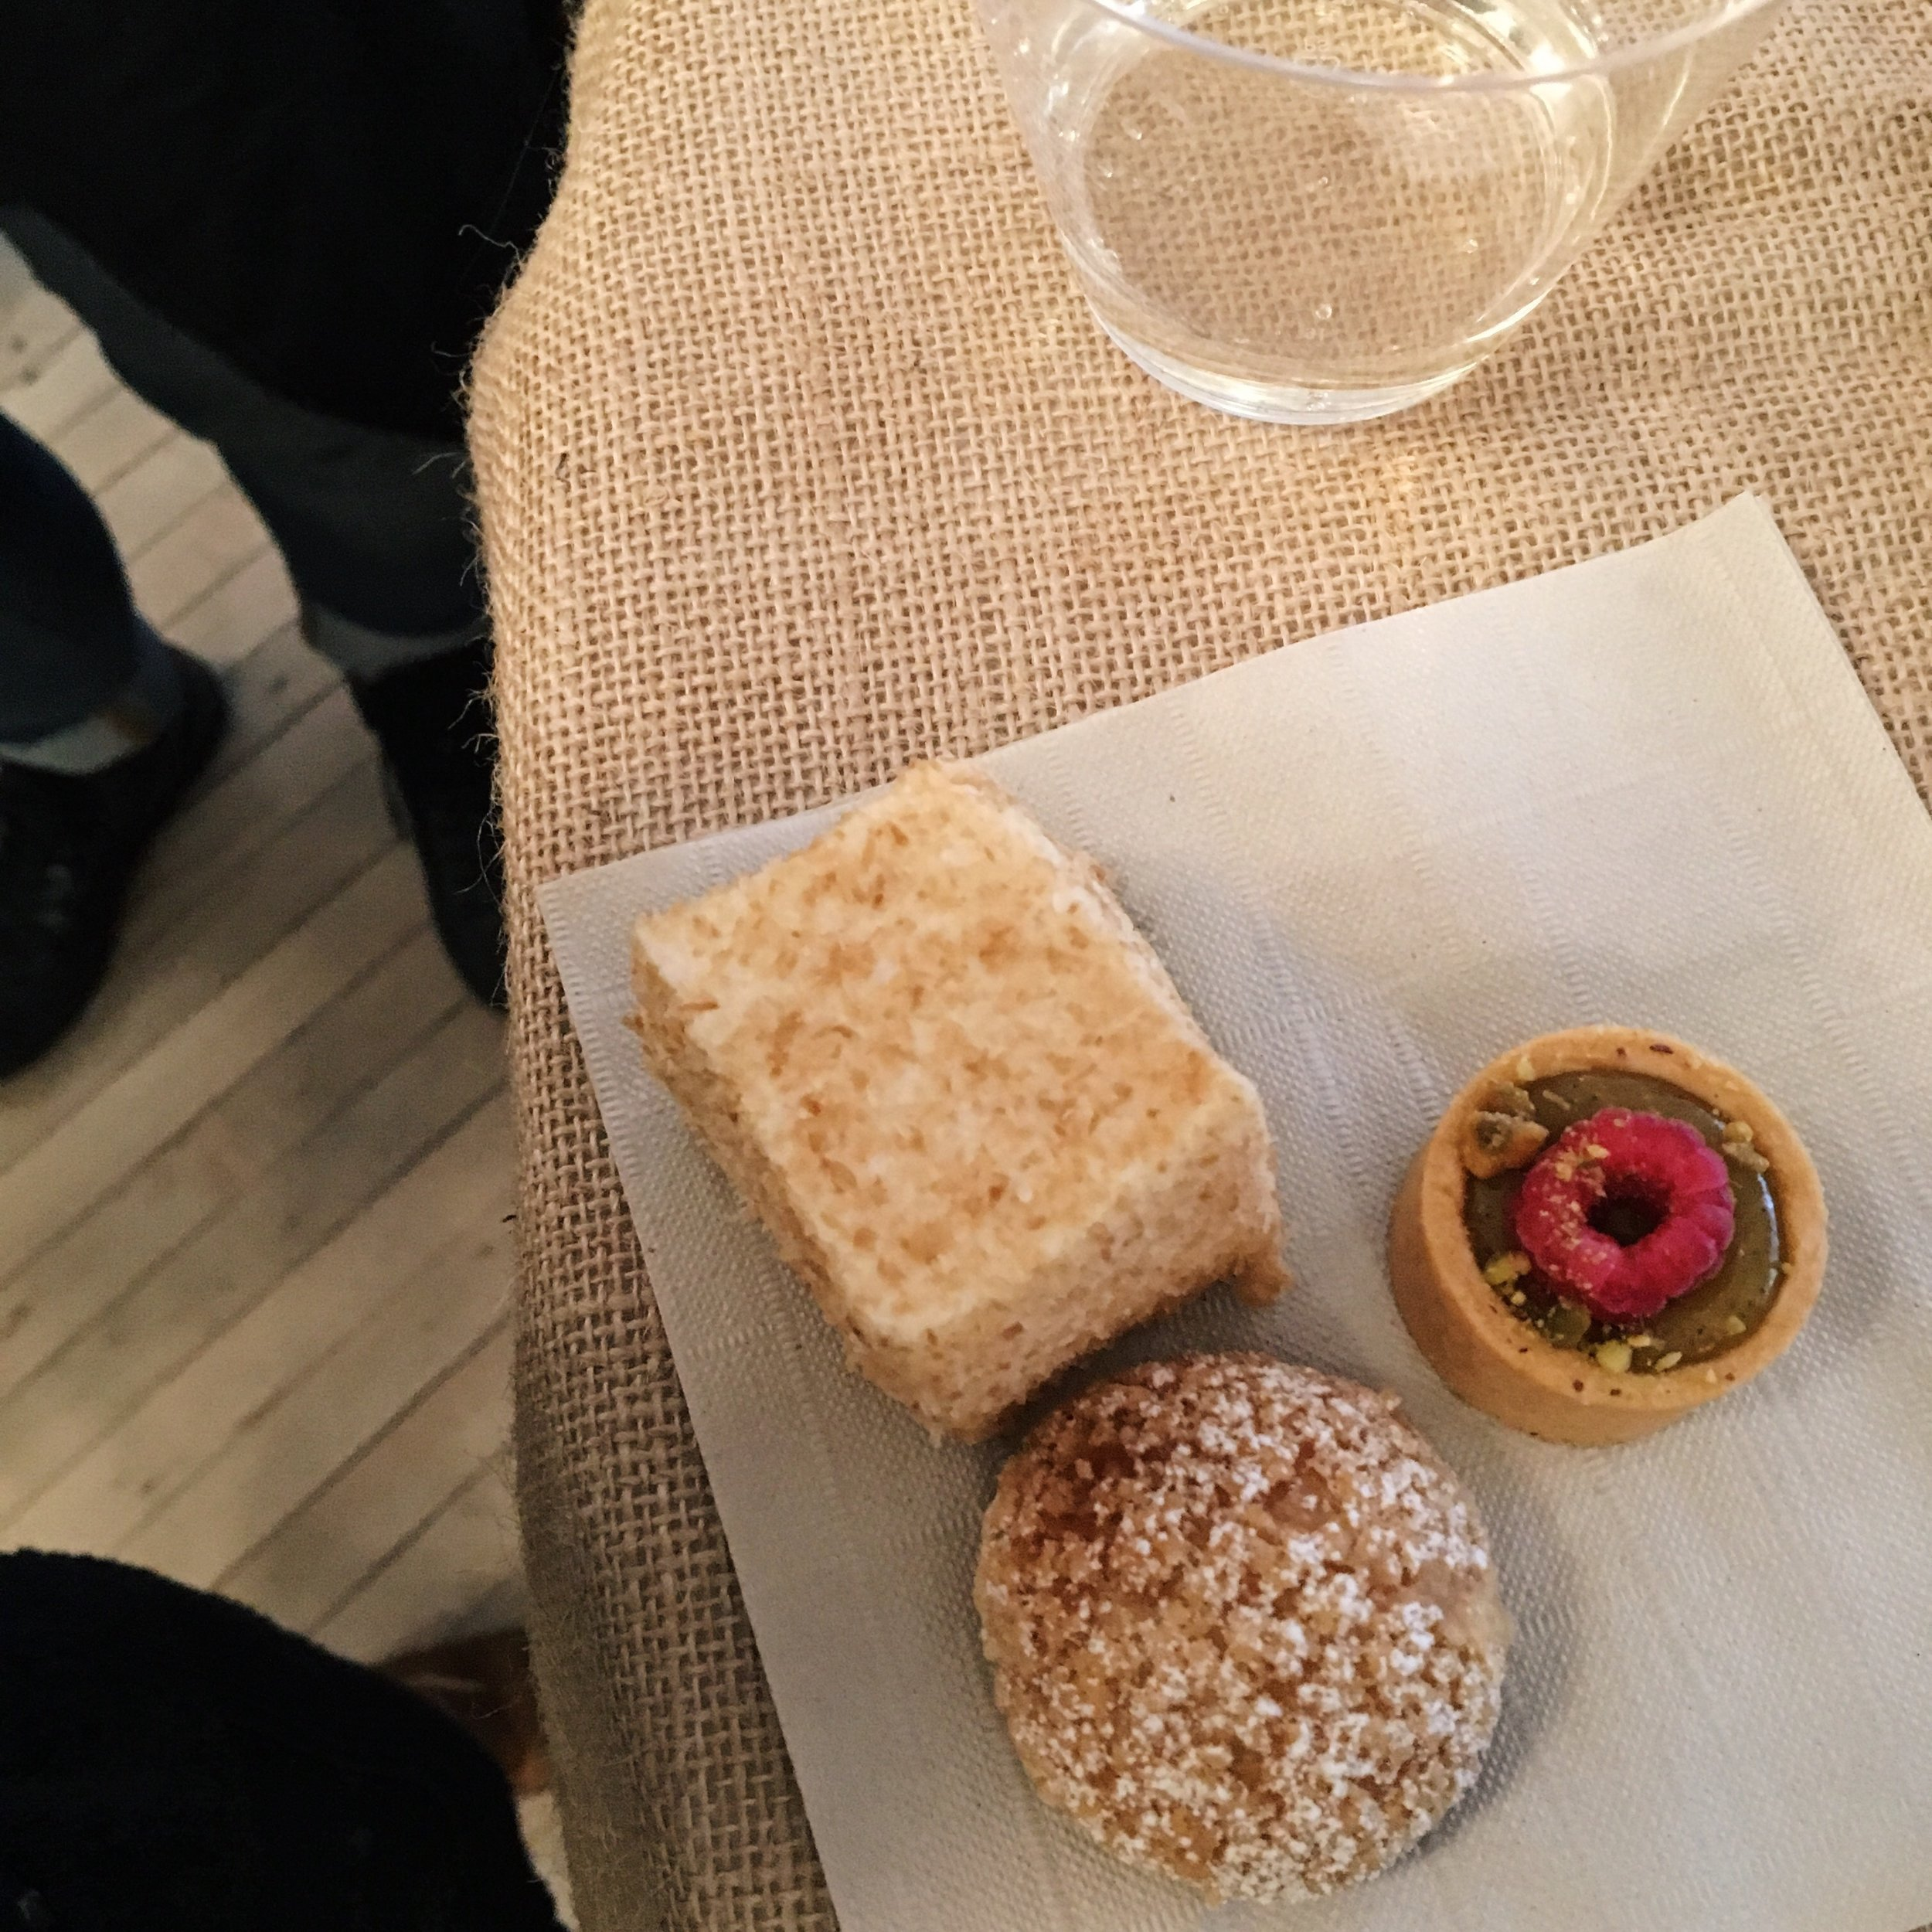 L to R: Coconut marshmallow, raspberry pistachio tart, choux